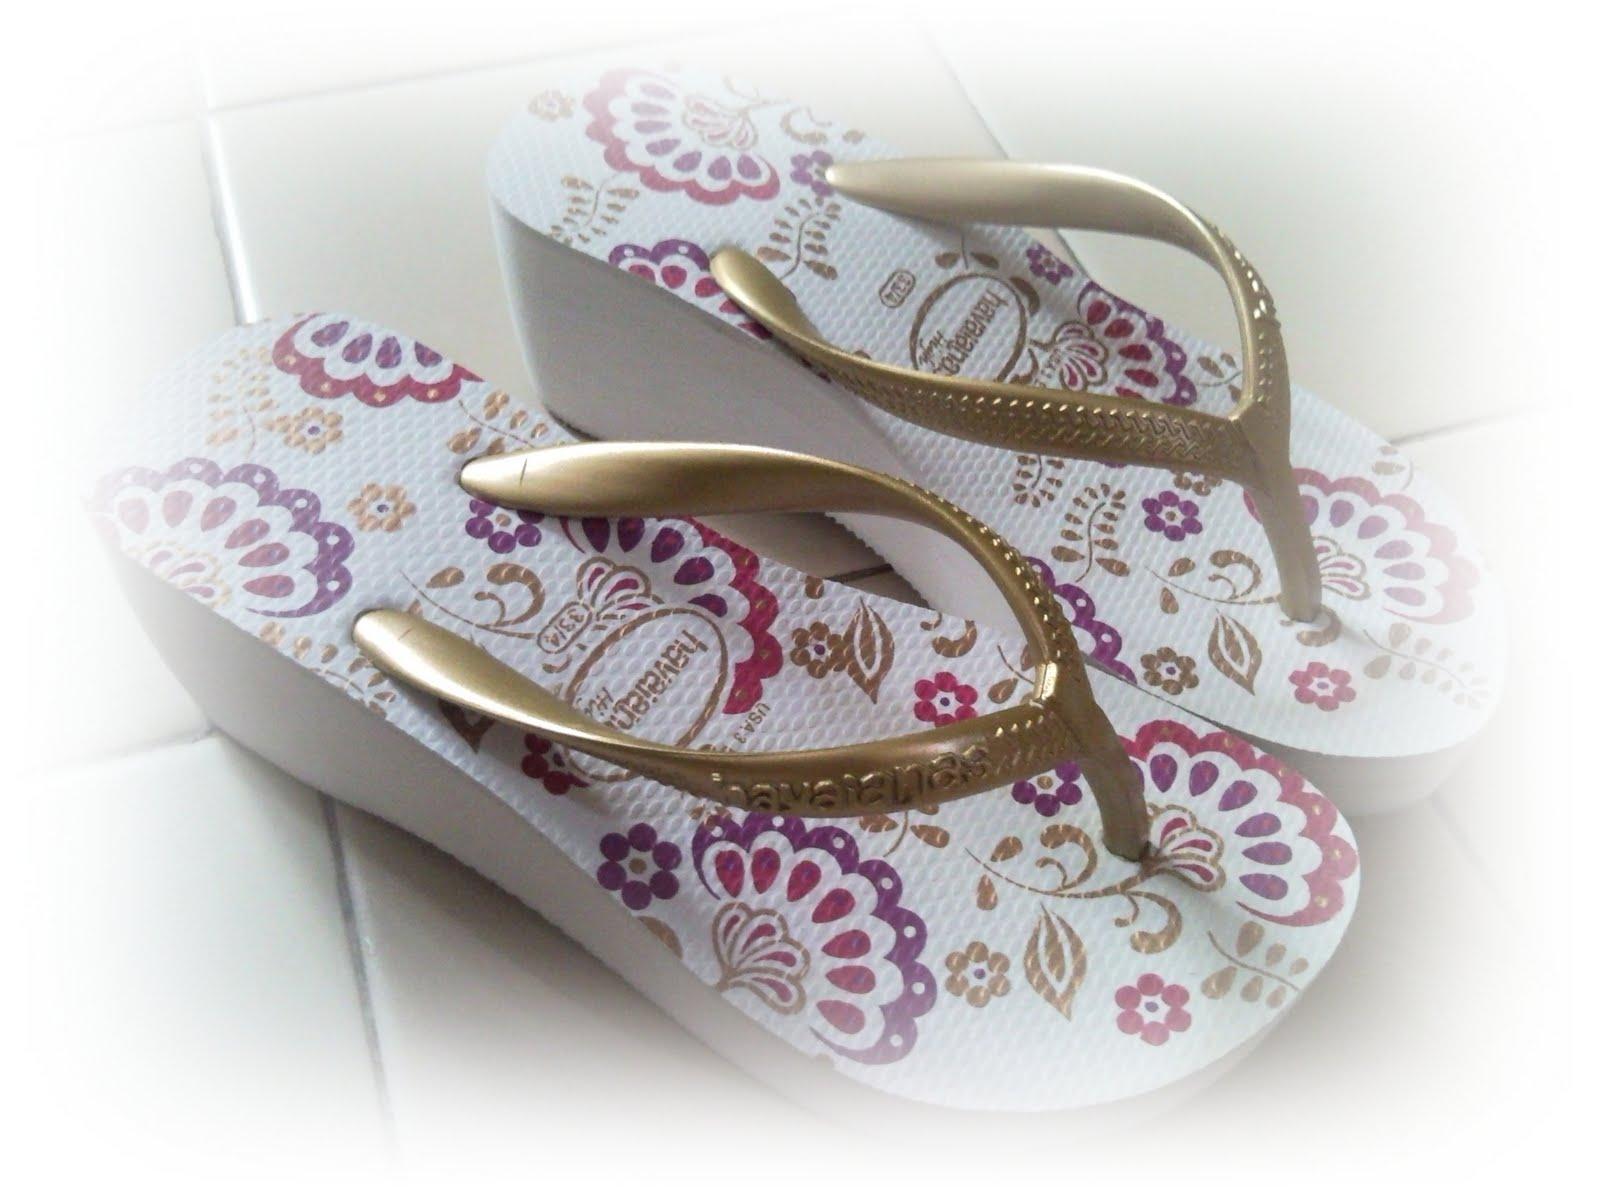 3cd045c02 Much wanted platform Havaianas. This is my informal comfort footwear.